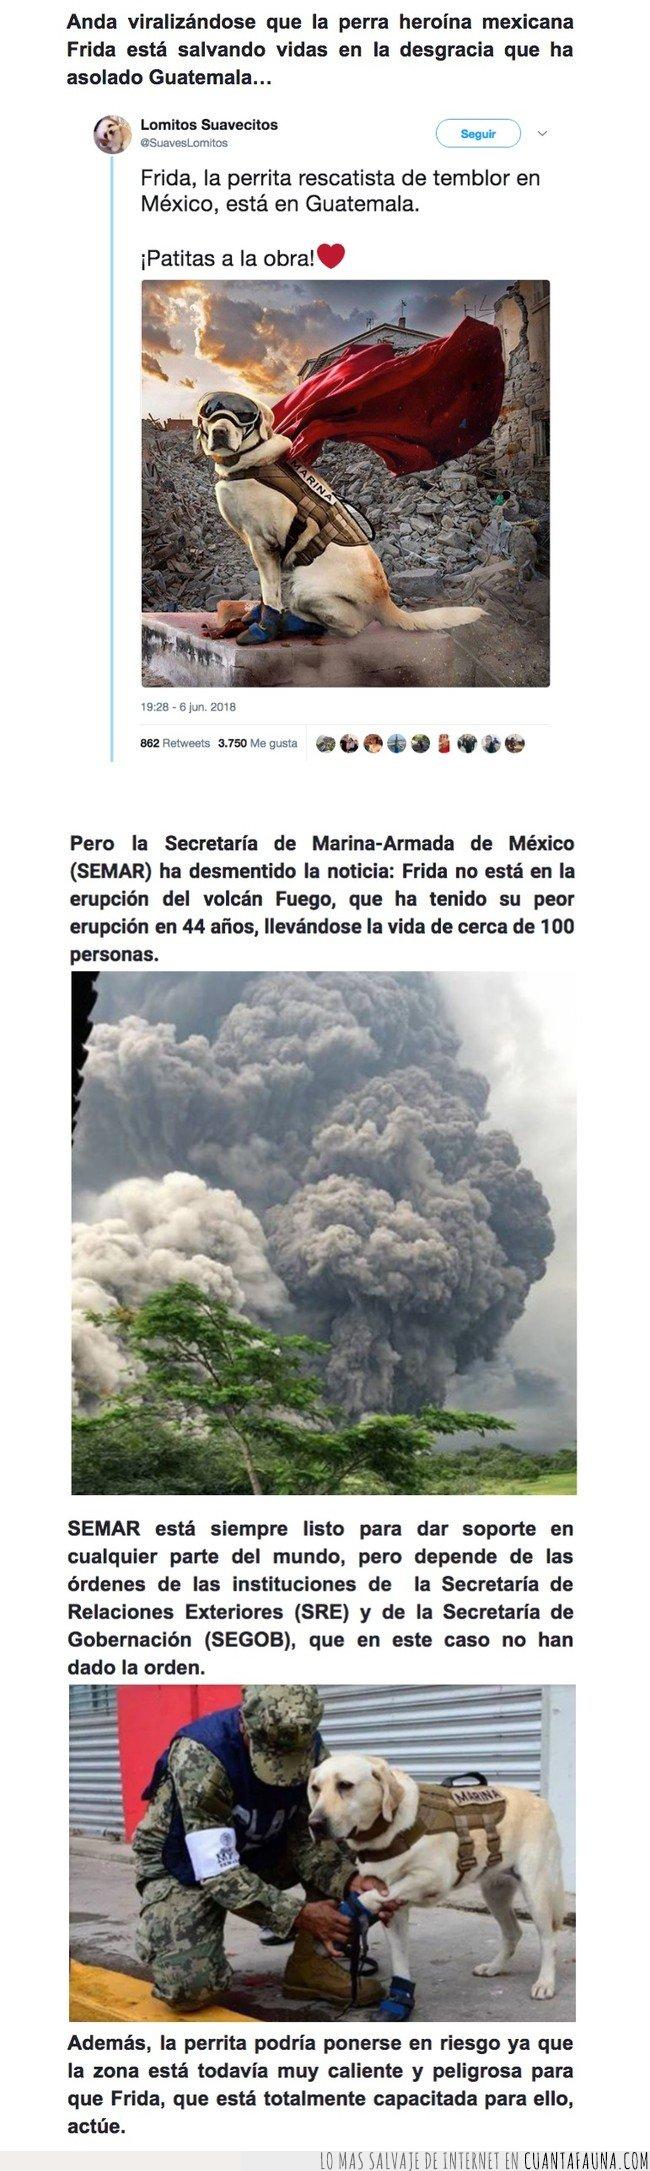 erupcion,frida,guatemala,mexico,rescate,volcan